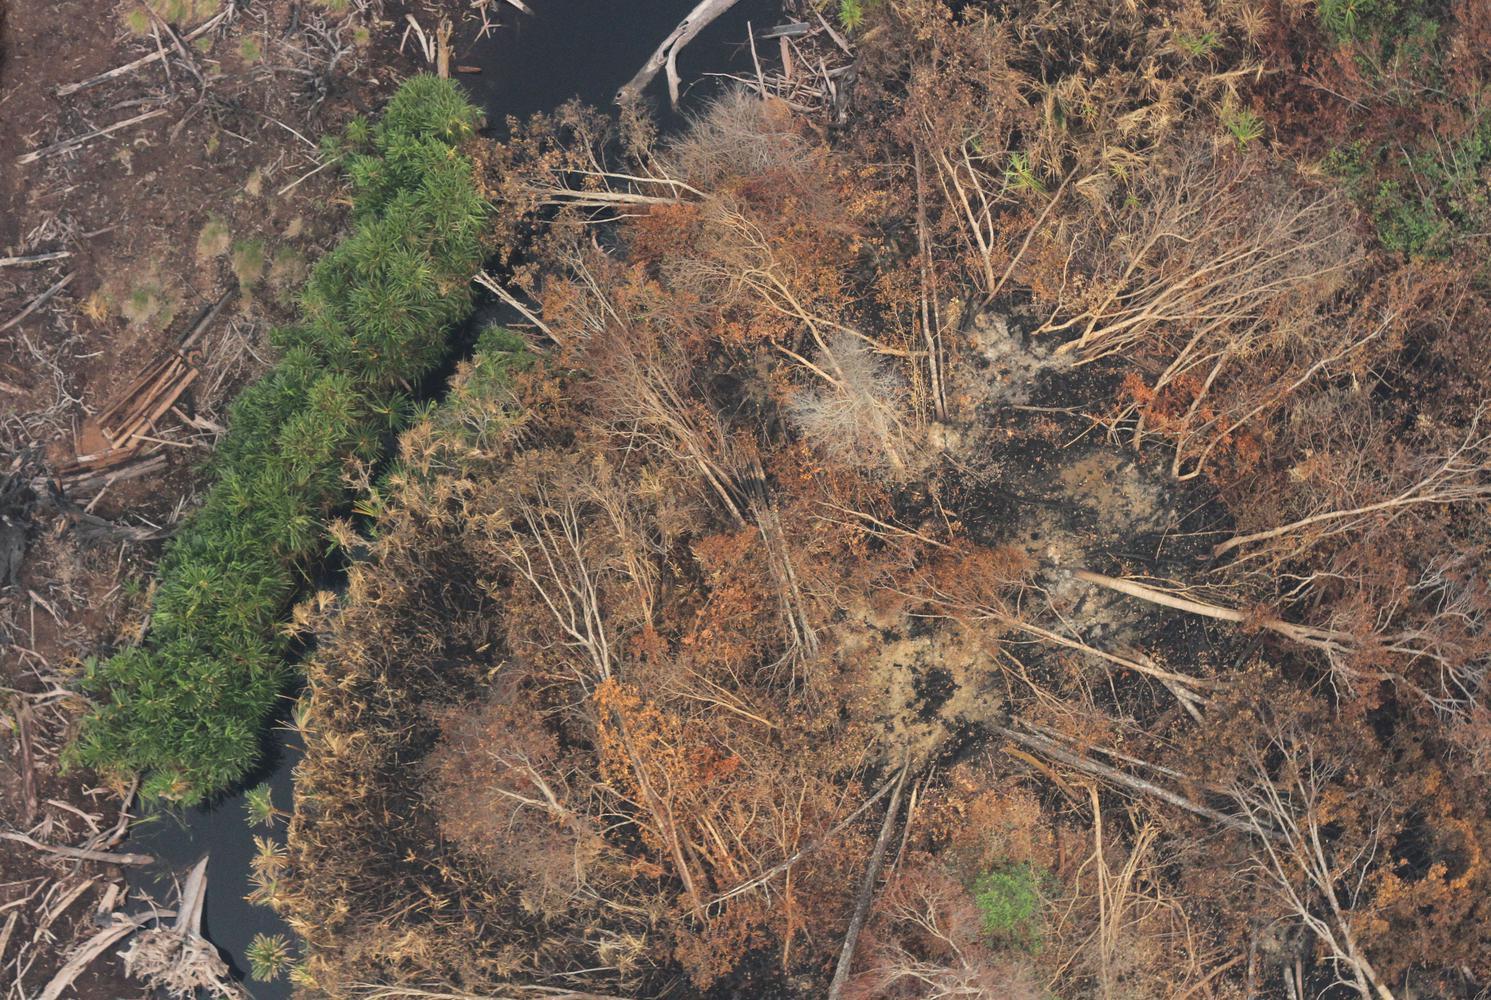 Karhutla Di Taman Nasional Sebangau